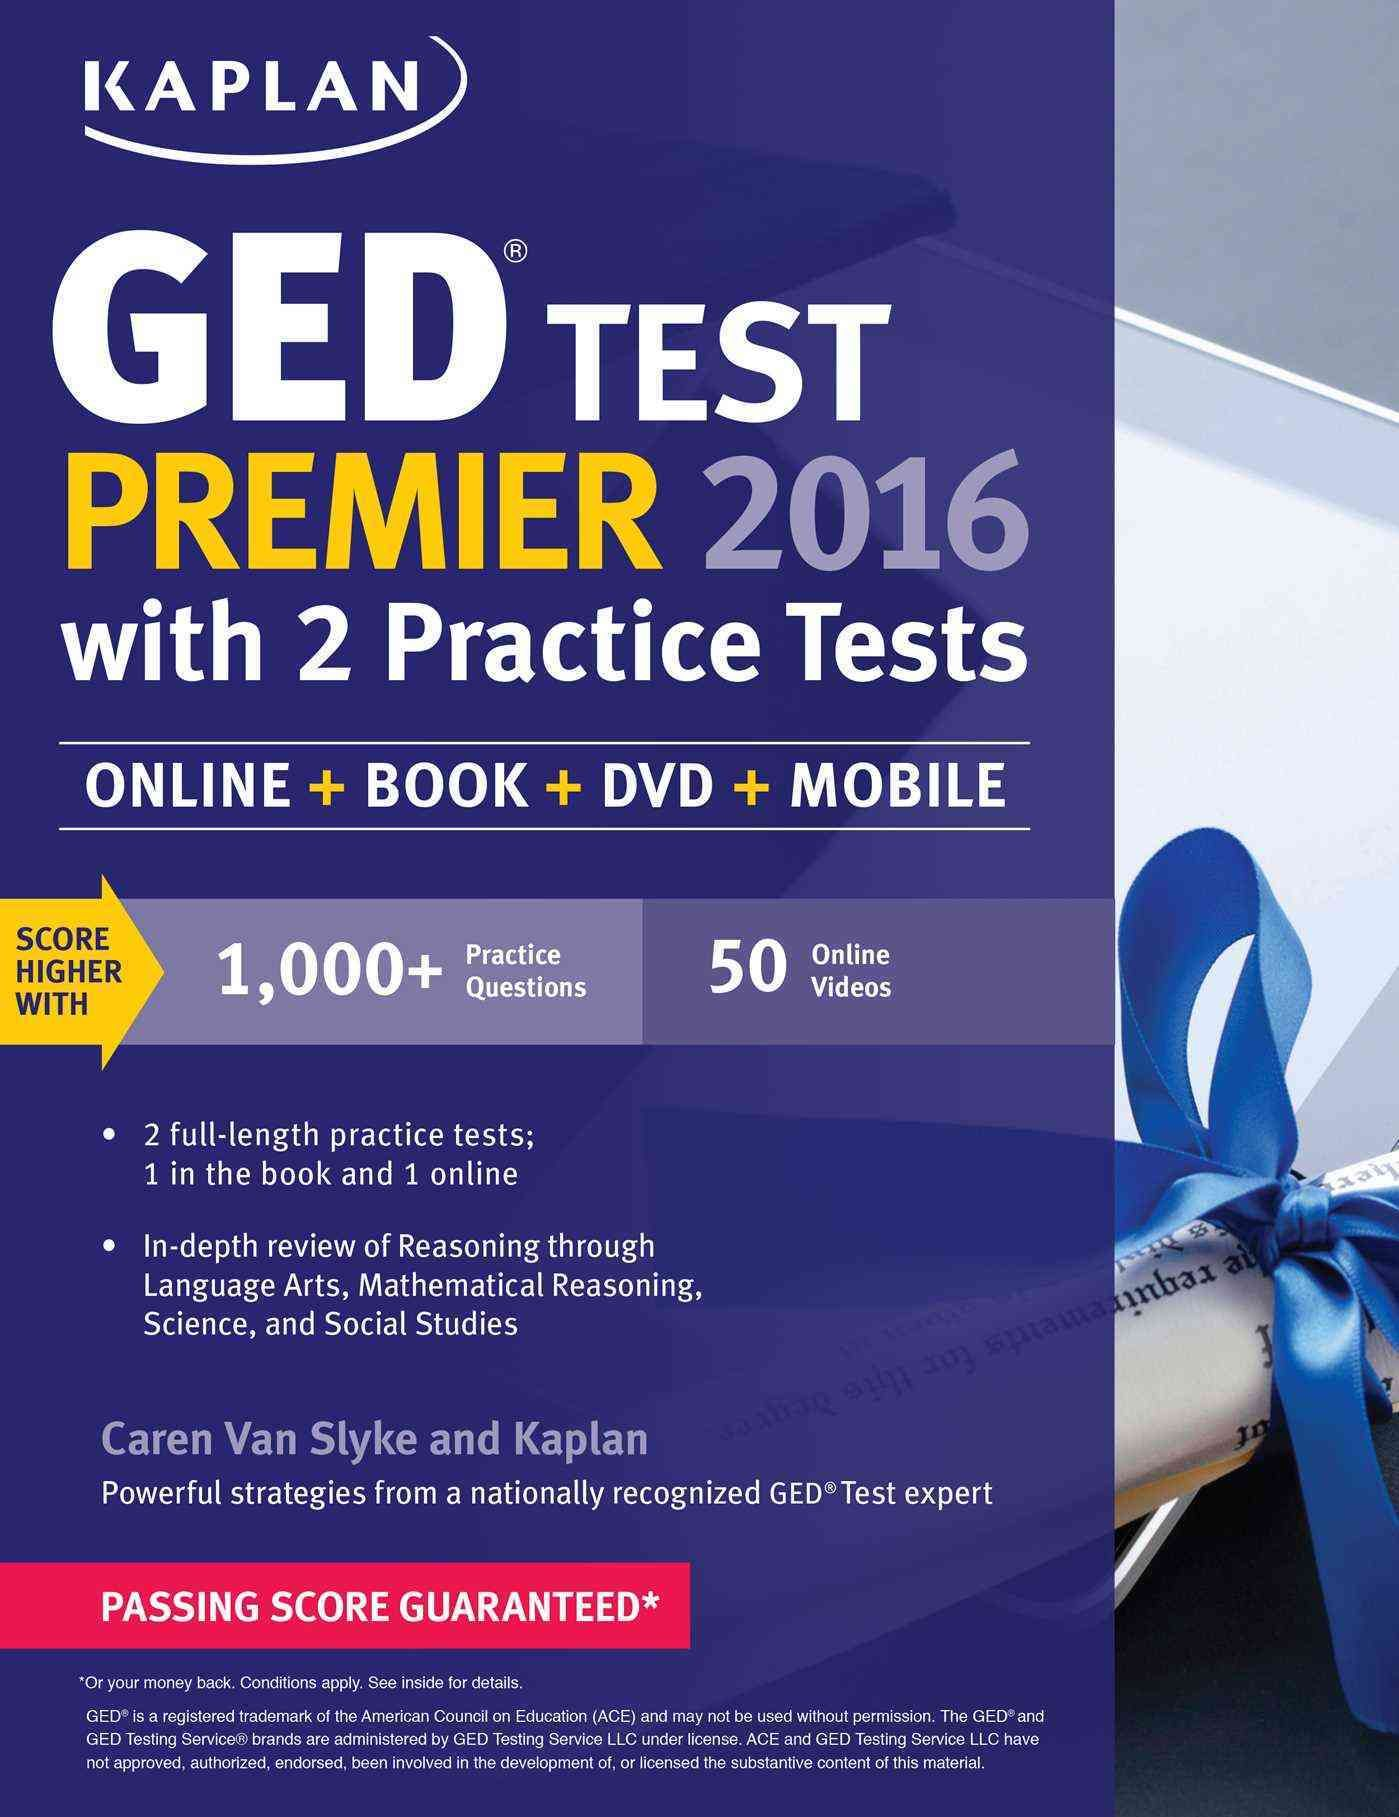 Kaplan Ged Test Premier Study Tools Online